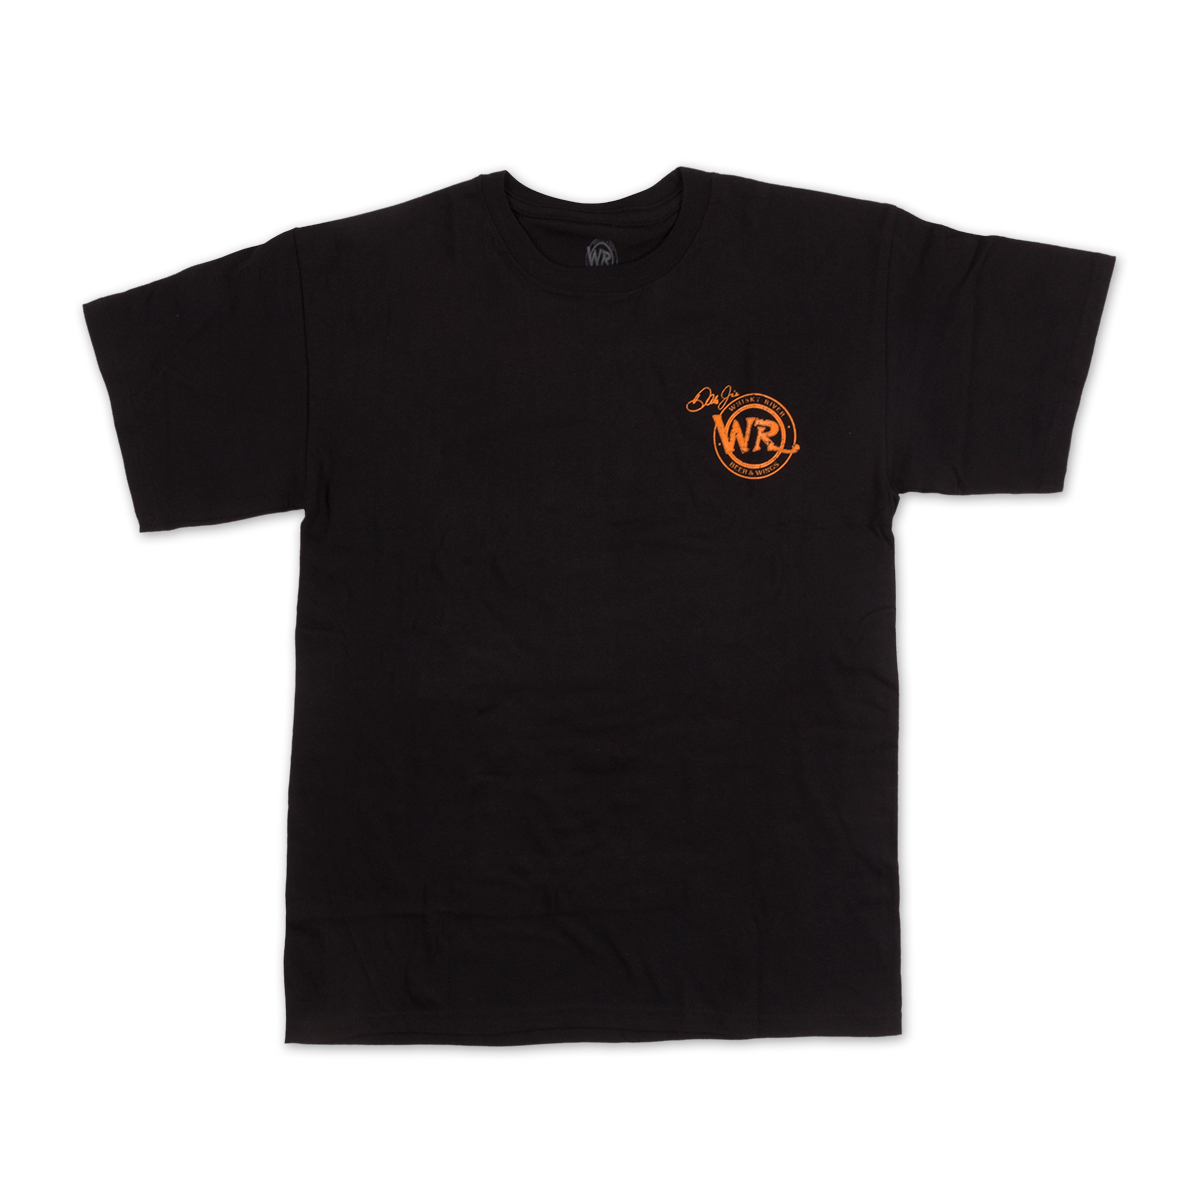 Whisky River Black Whisky Label T-shirt